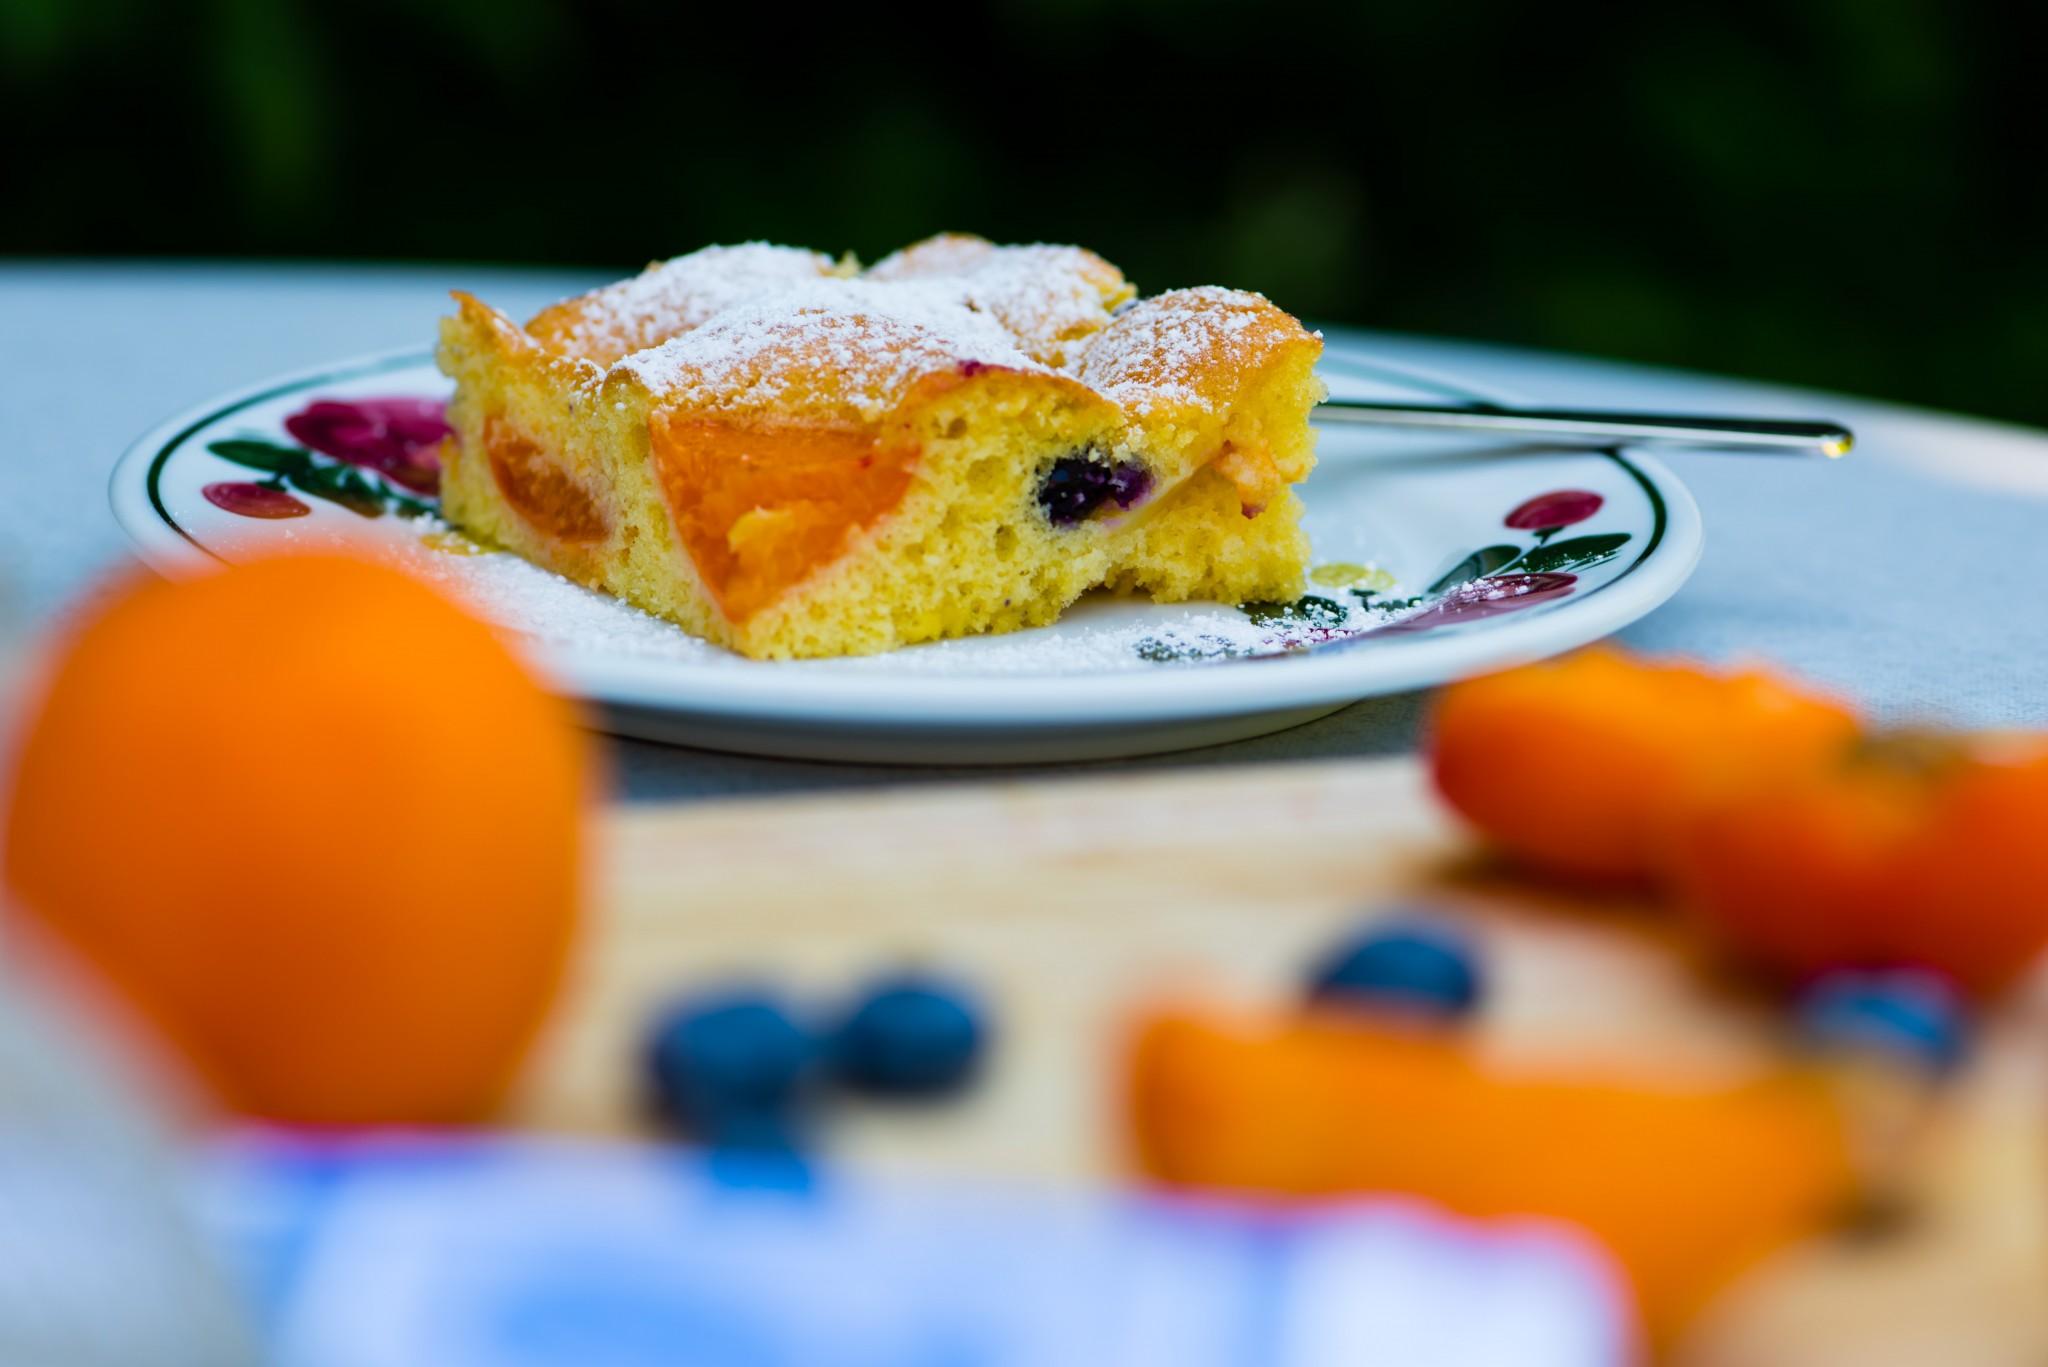 Marillen-Heidelbeer-Kuchen